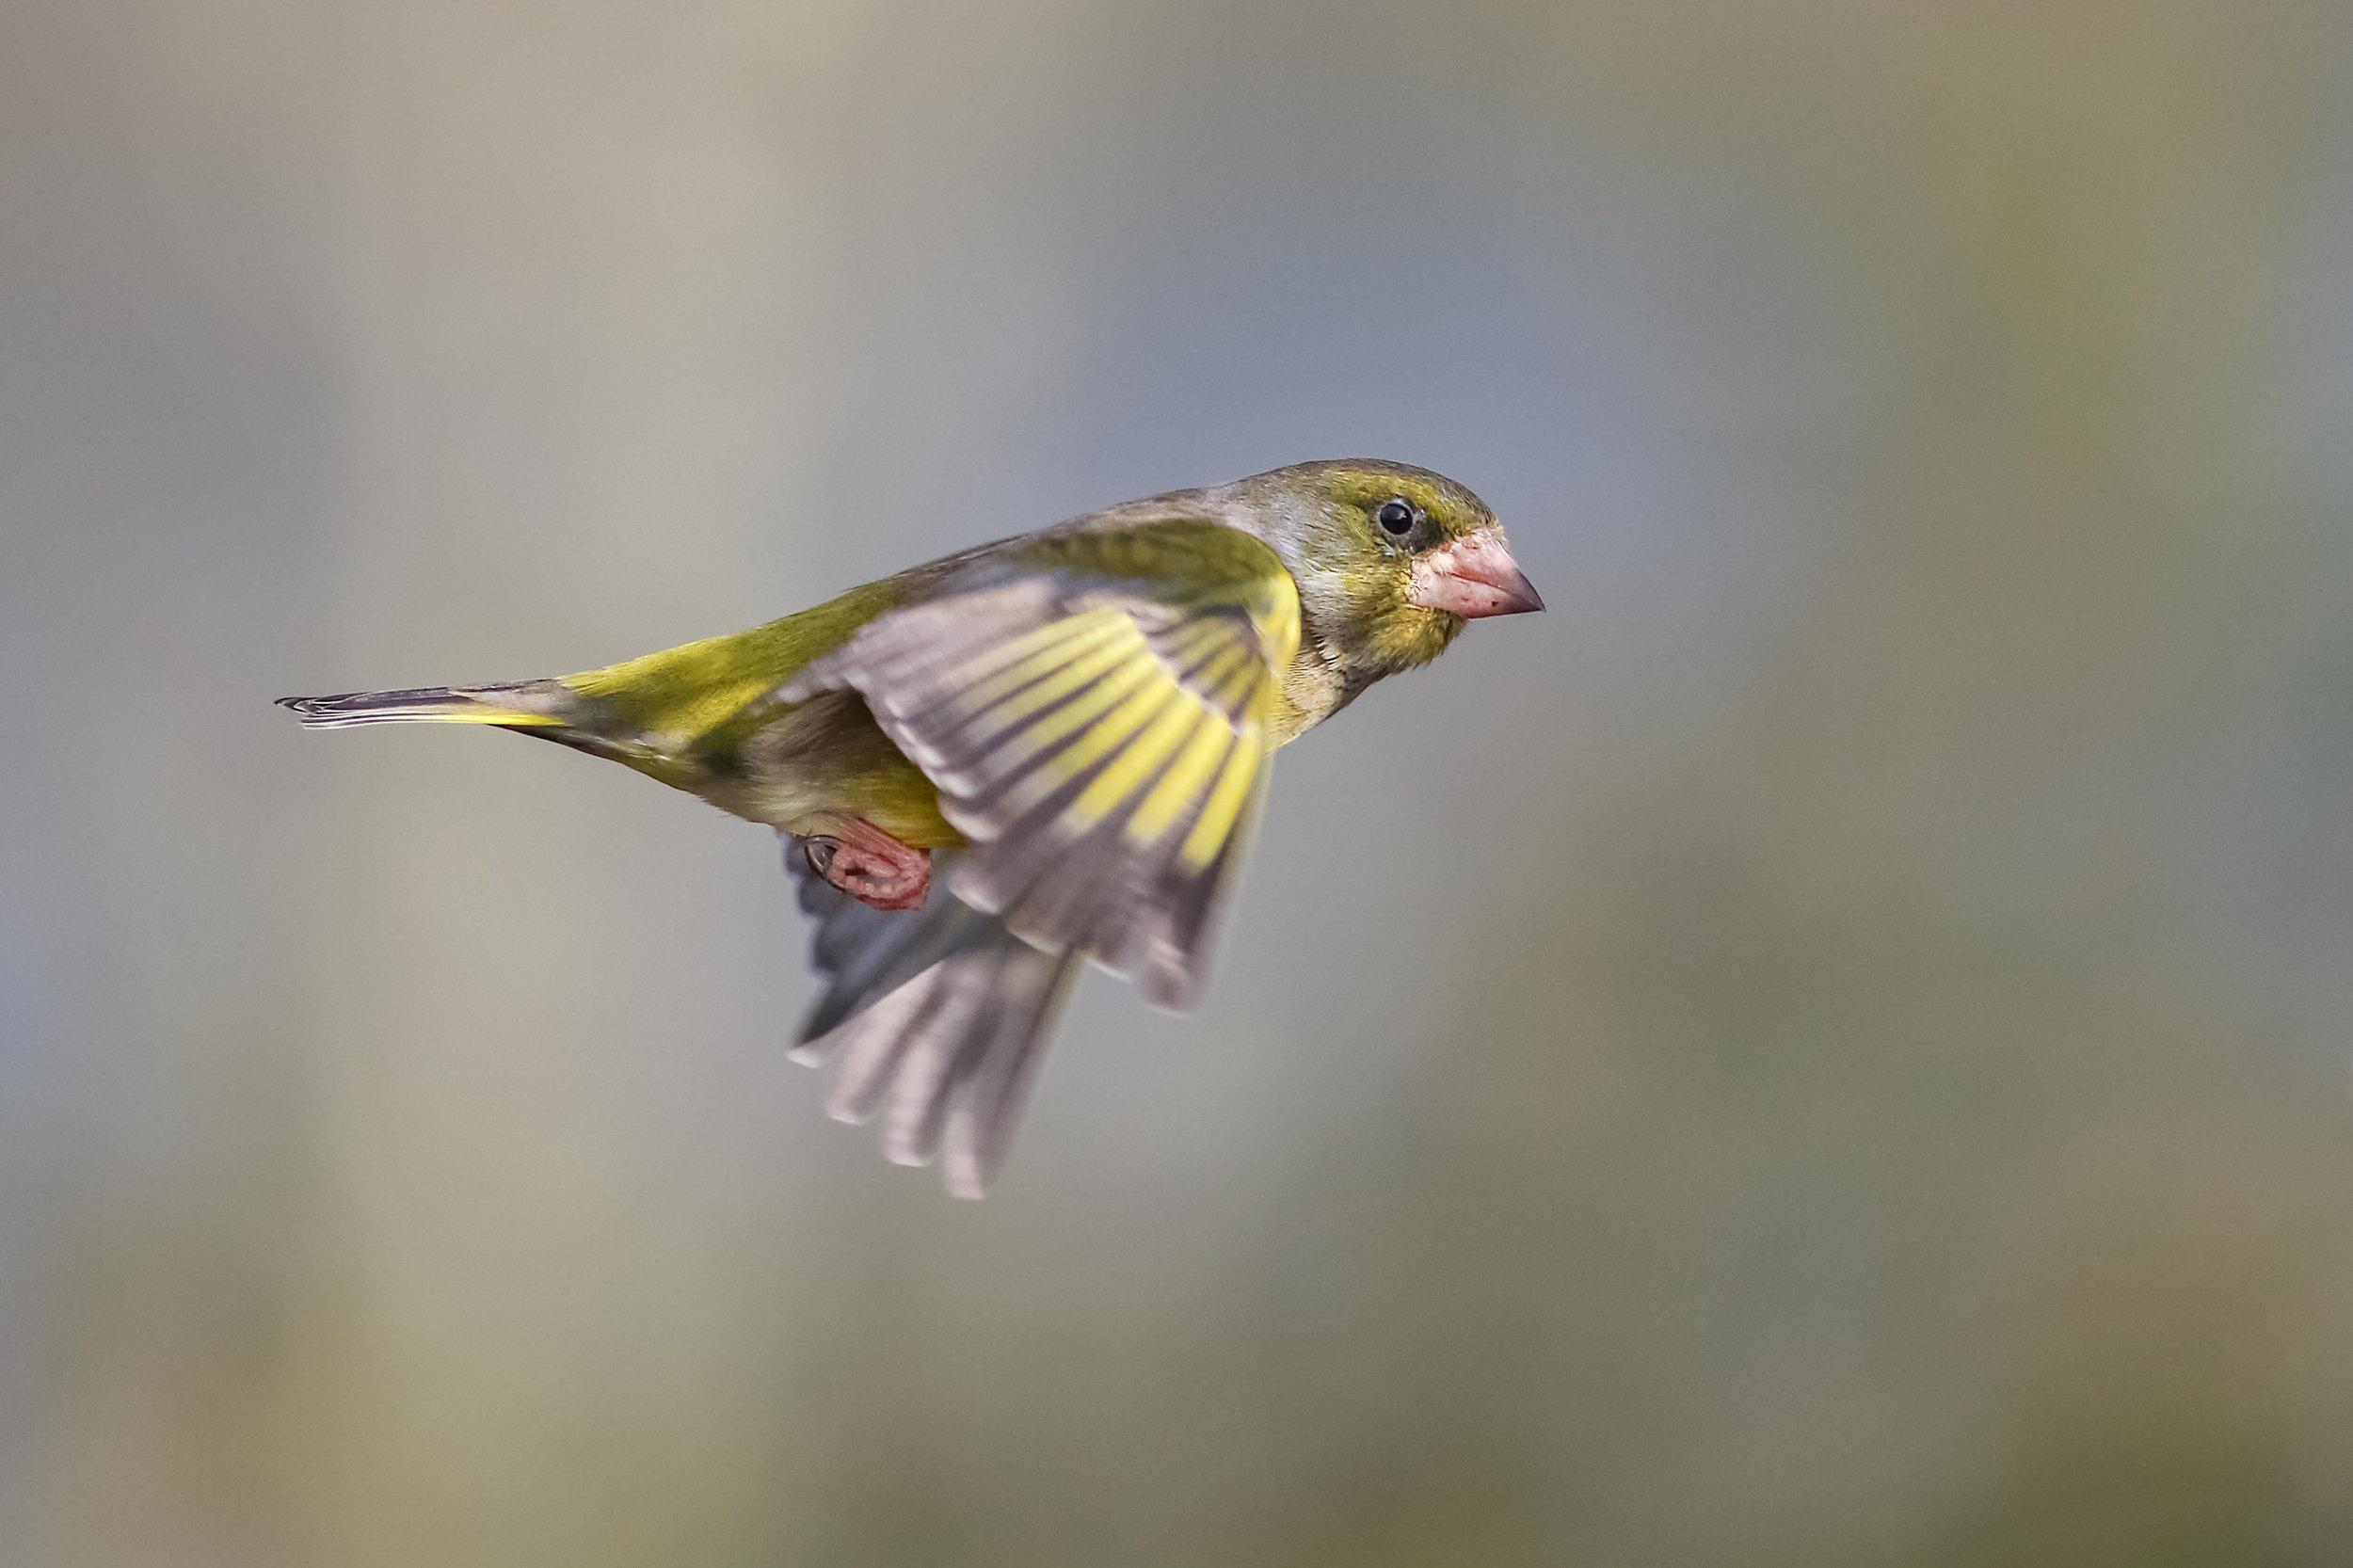 Greenfinch flypast